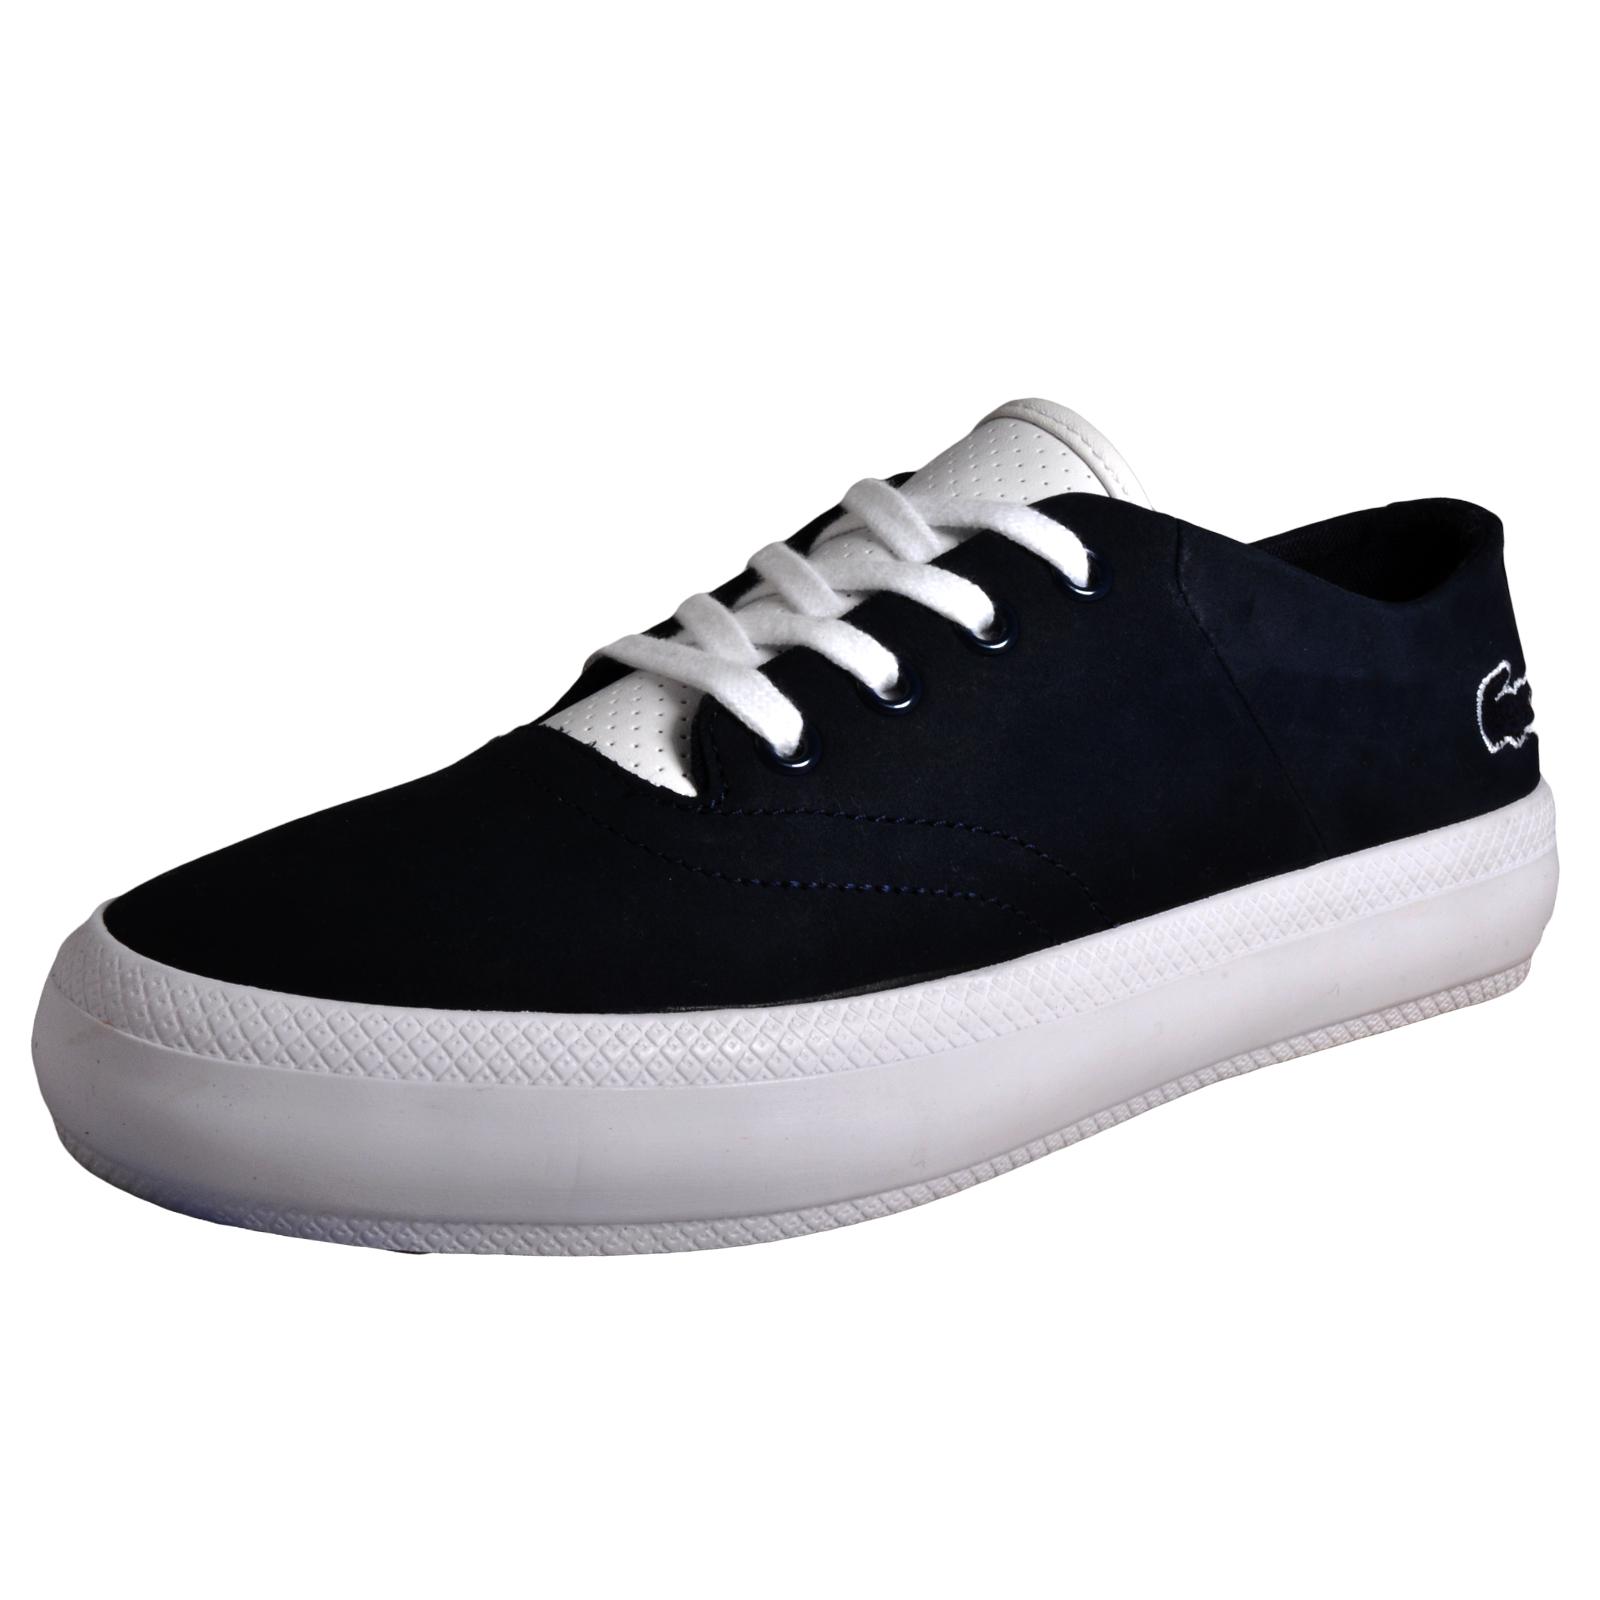 New Women's Nike Flex Trainer 4 UK8/EU42.5. Authentic Trainers/Running Shoes